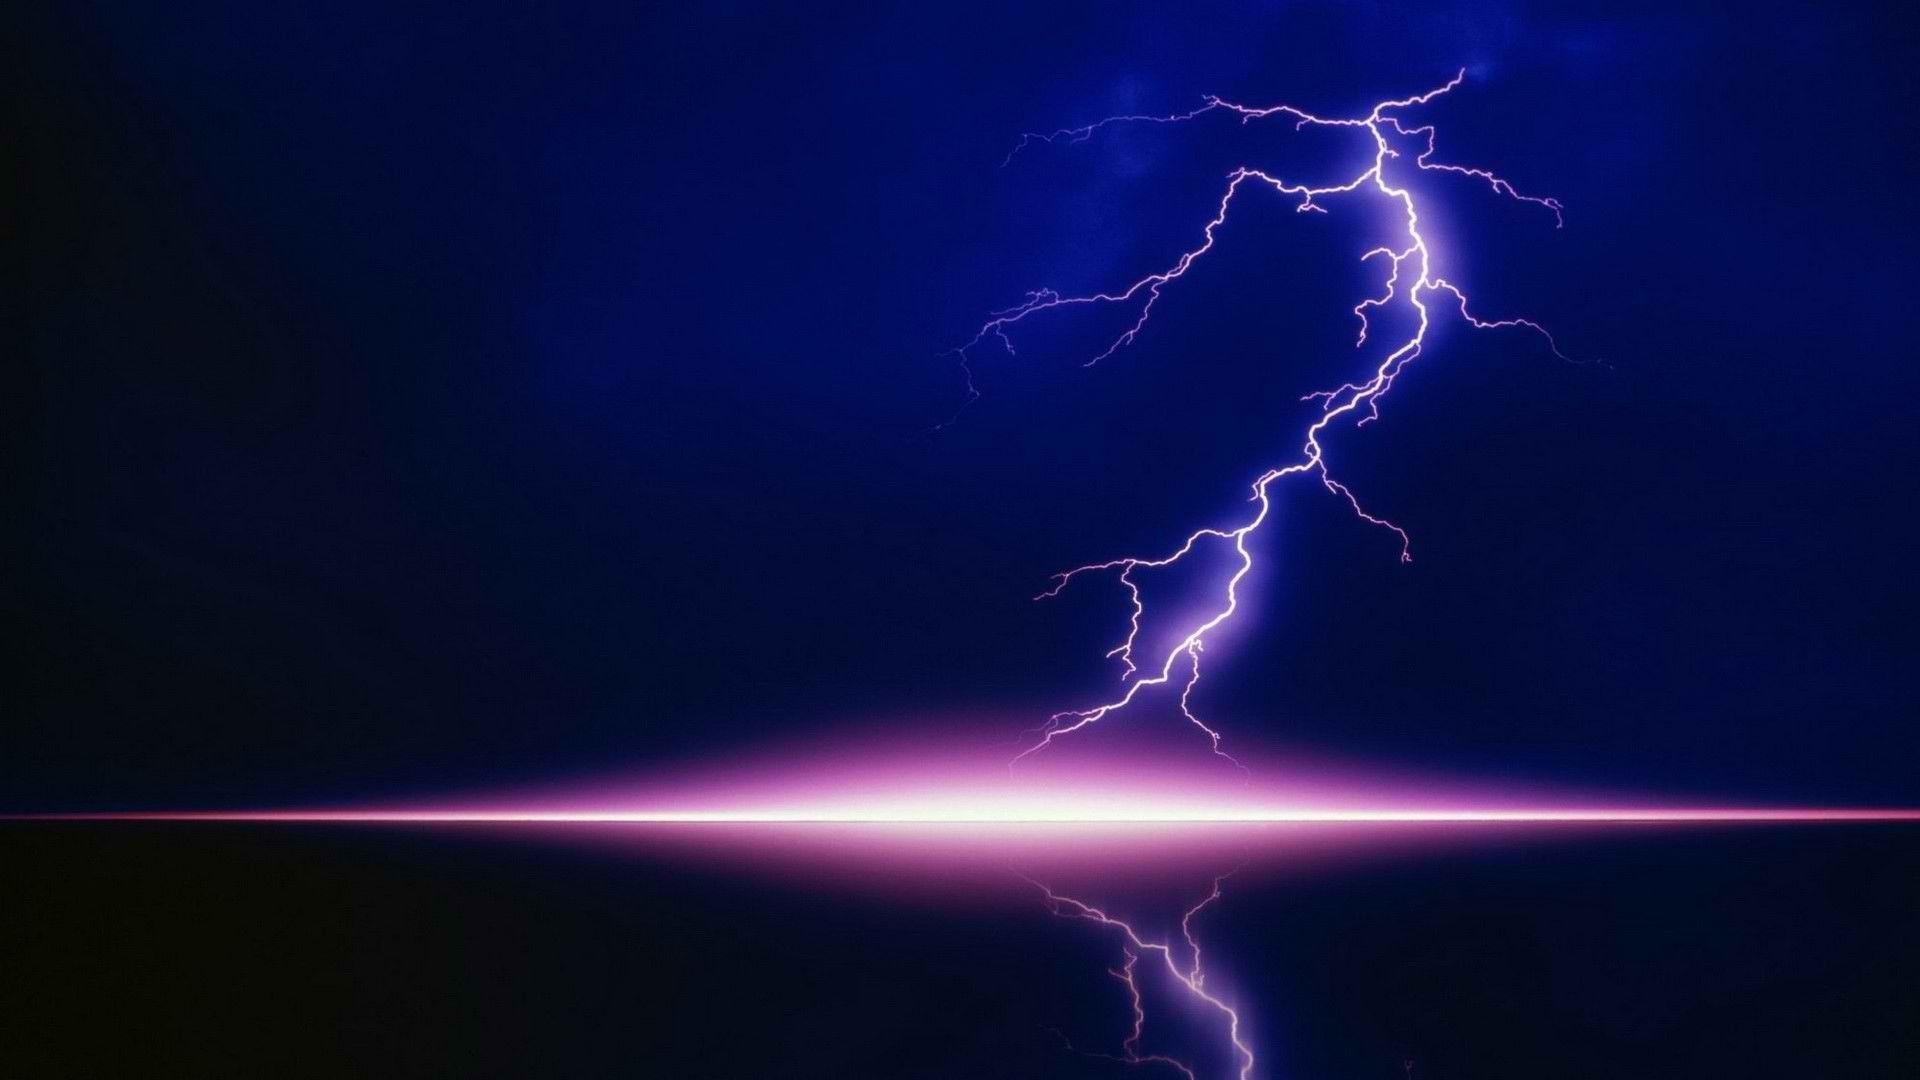 Metallica ride the lightning for whom the bell tolls metontour quito ecuador 2014 - 1 2